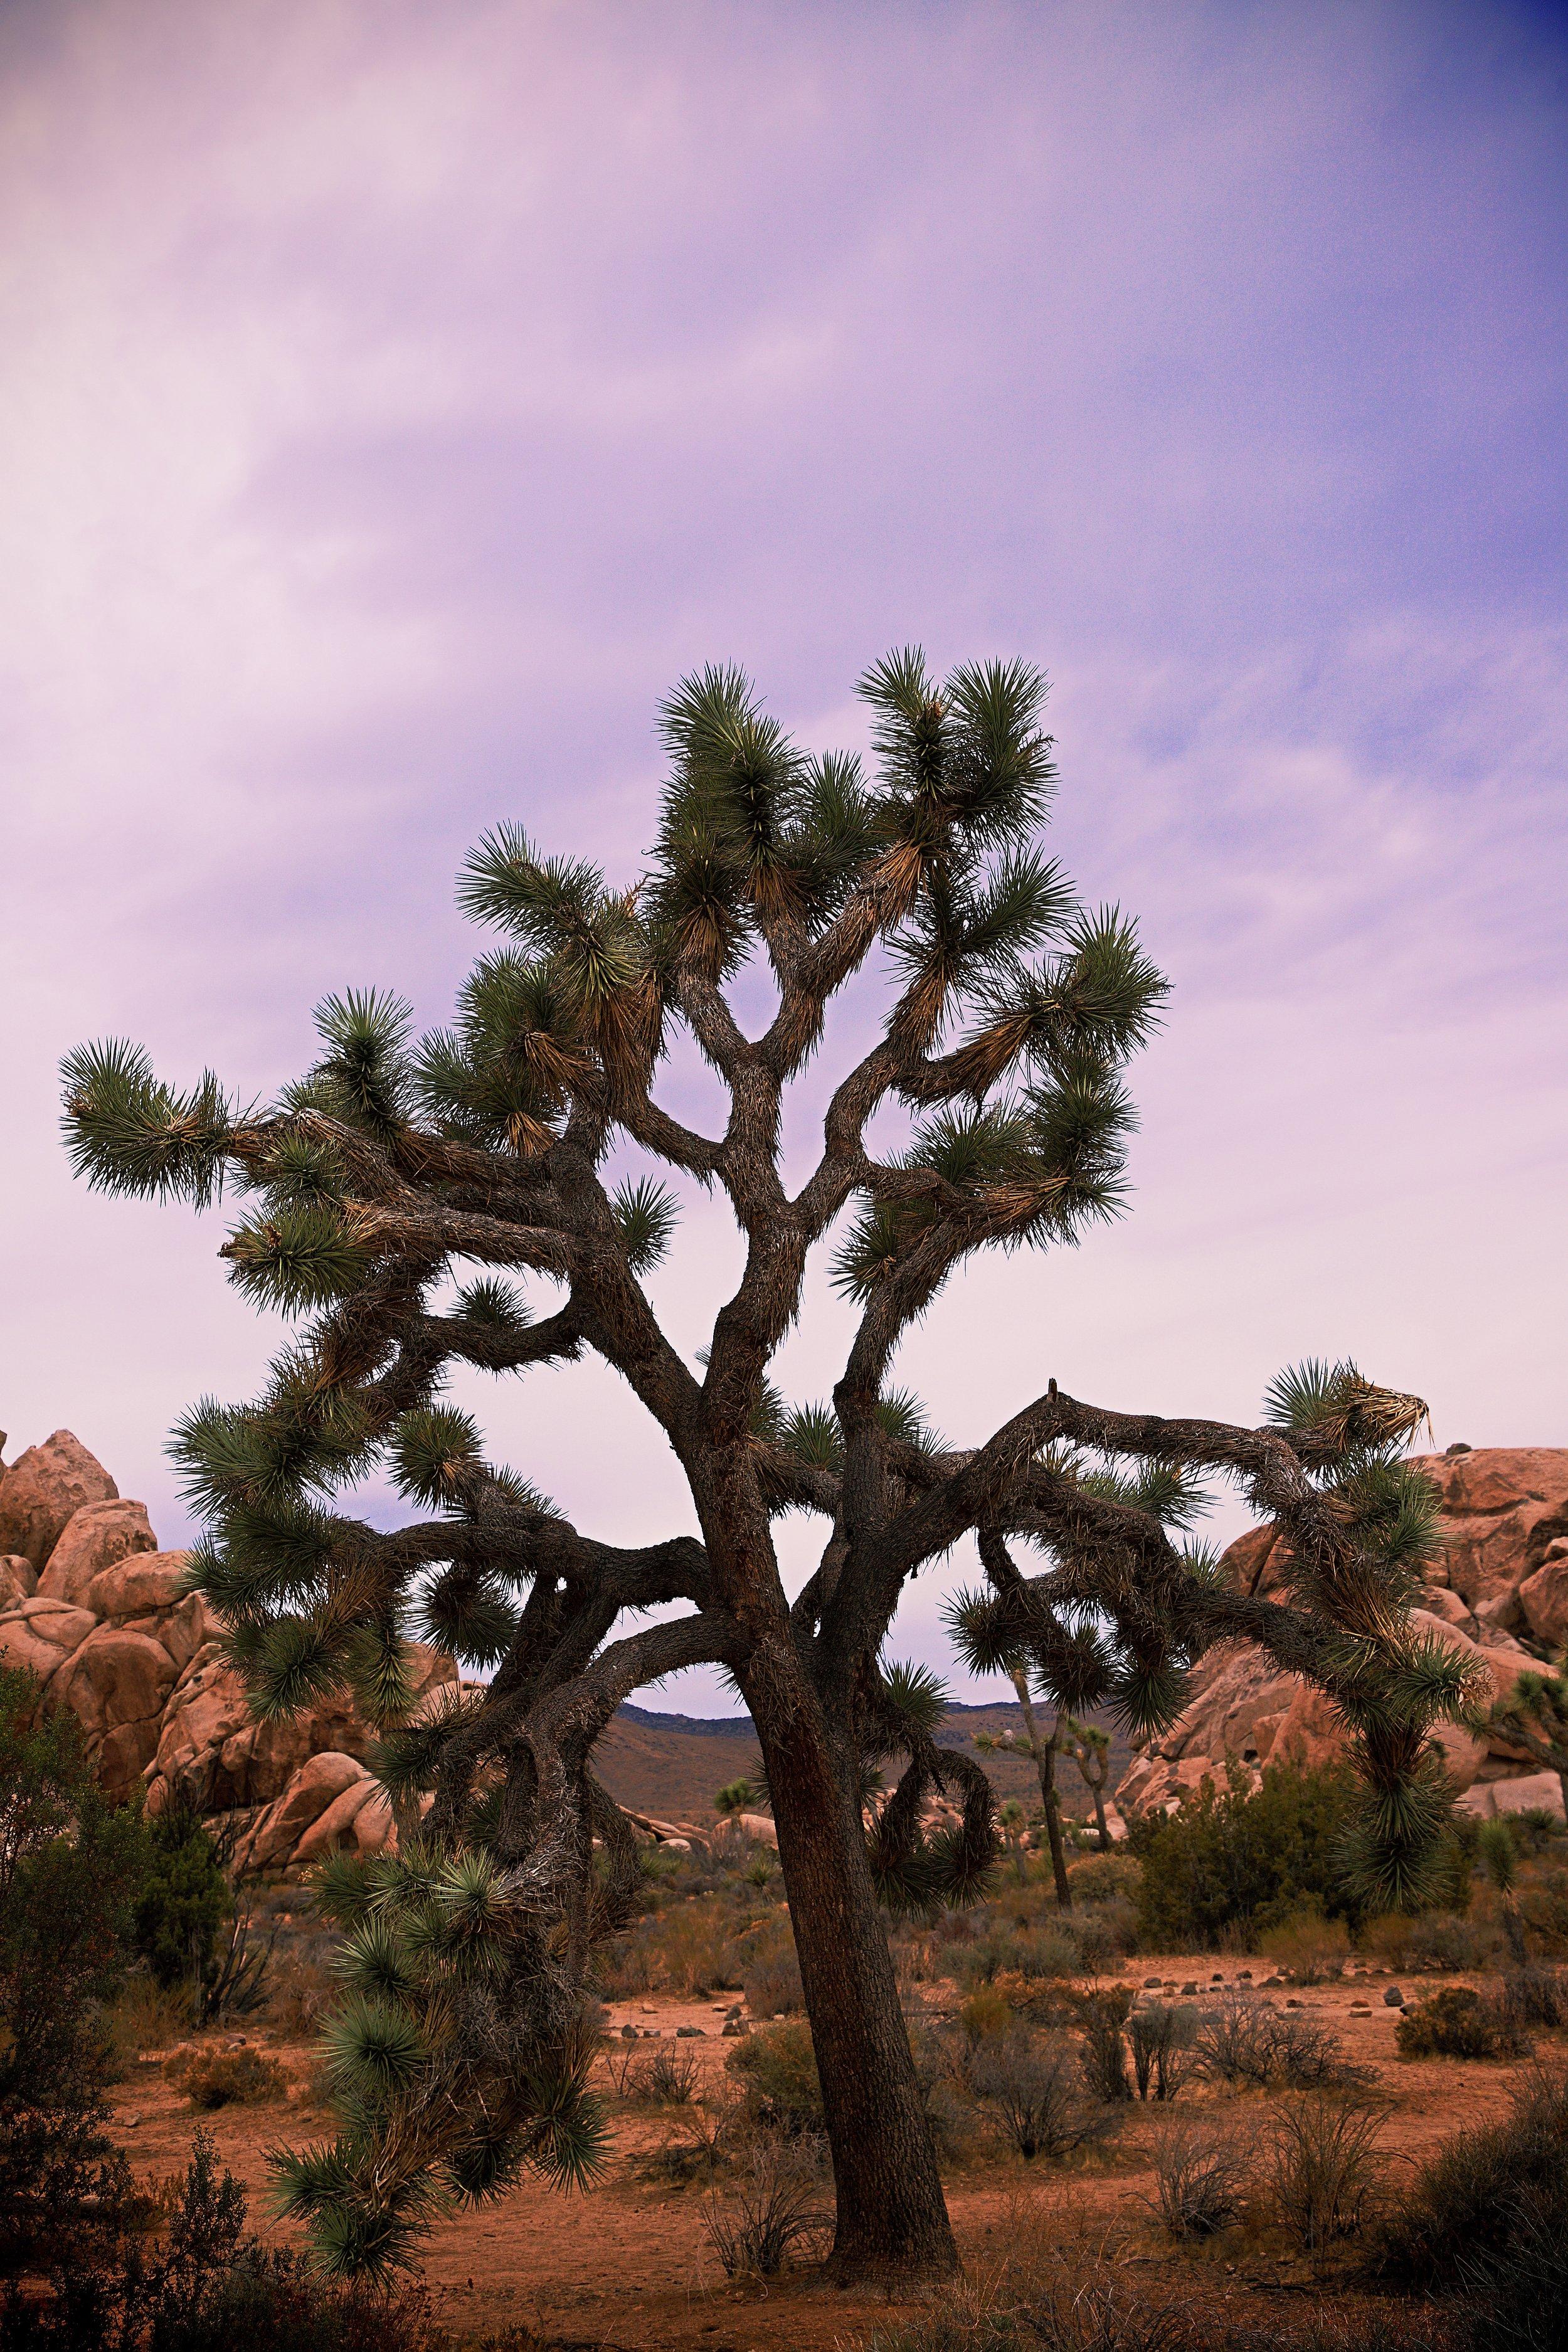 IMG_7443_x joshua tree.jpg